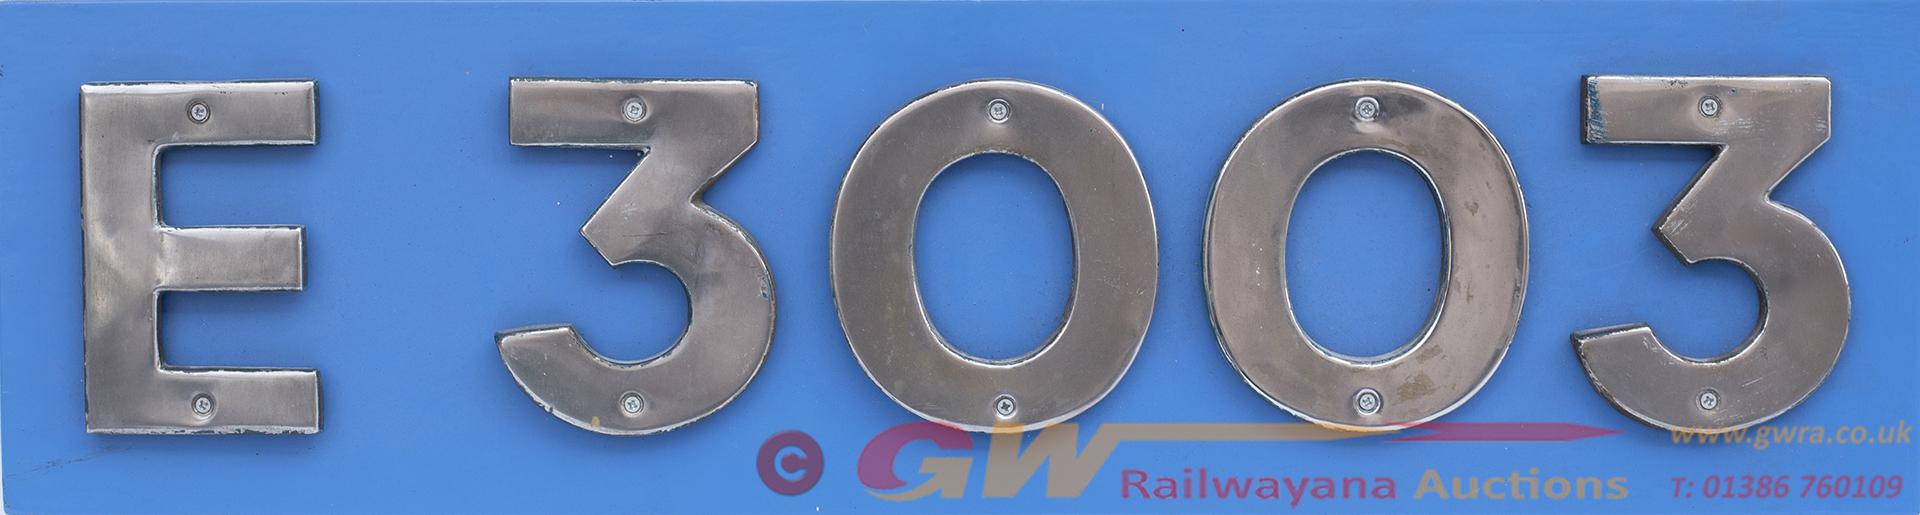 Cabside Numbers e3003 Ex British Railways Electric